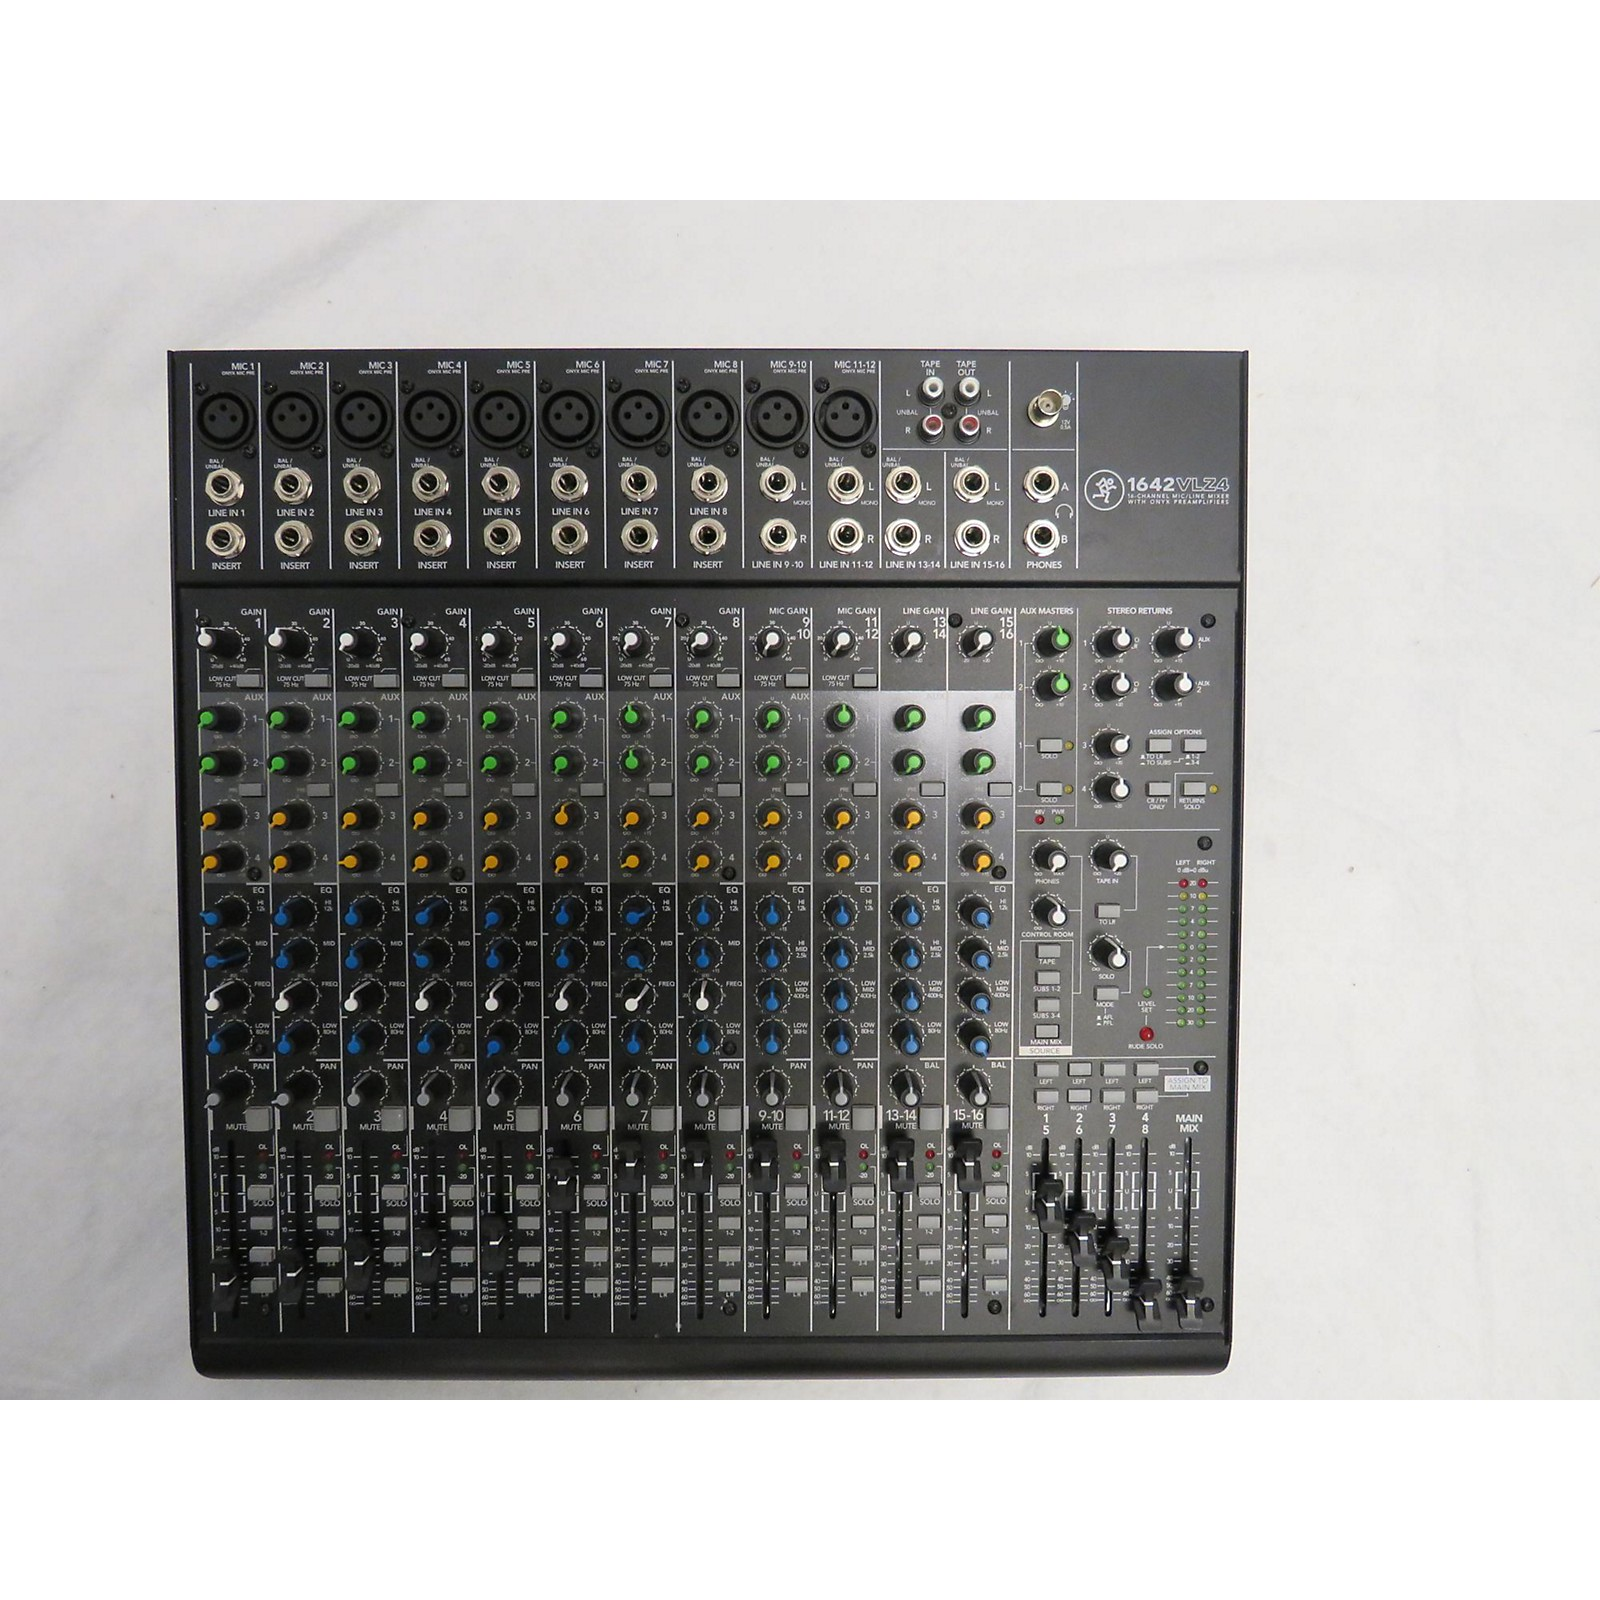 Mackie 1642VLZ4 Unpowered Mixer